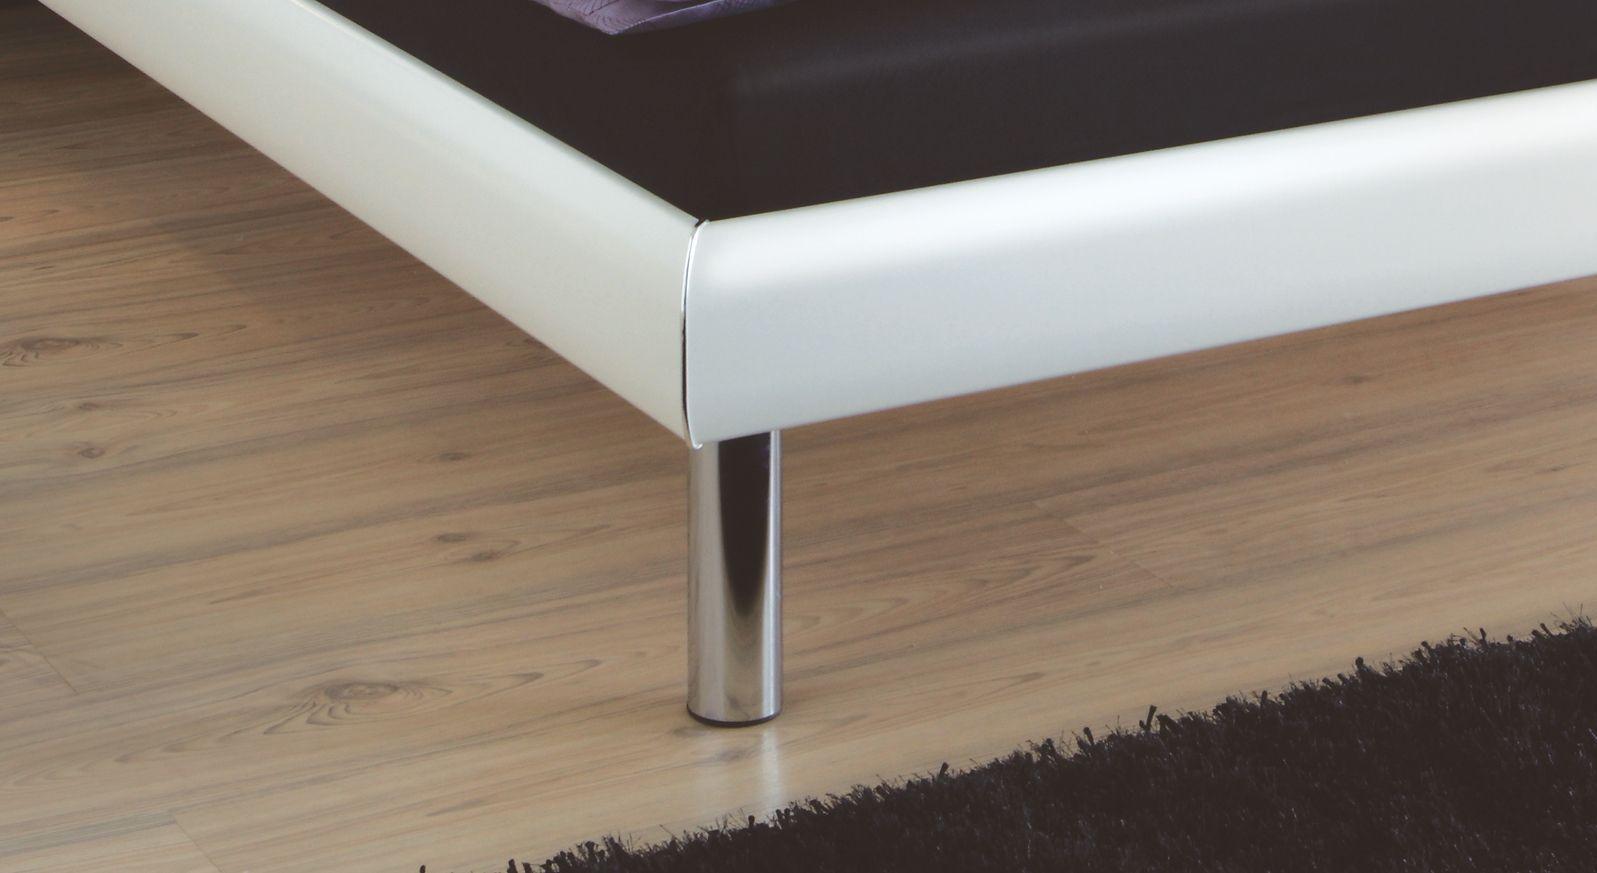 Bett Cordoba Bettbeine Füße zylinderförmig stabil